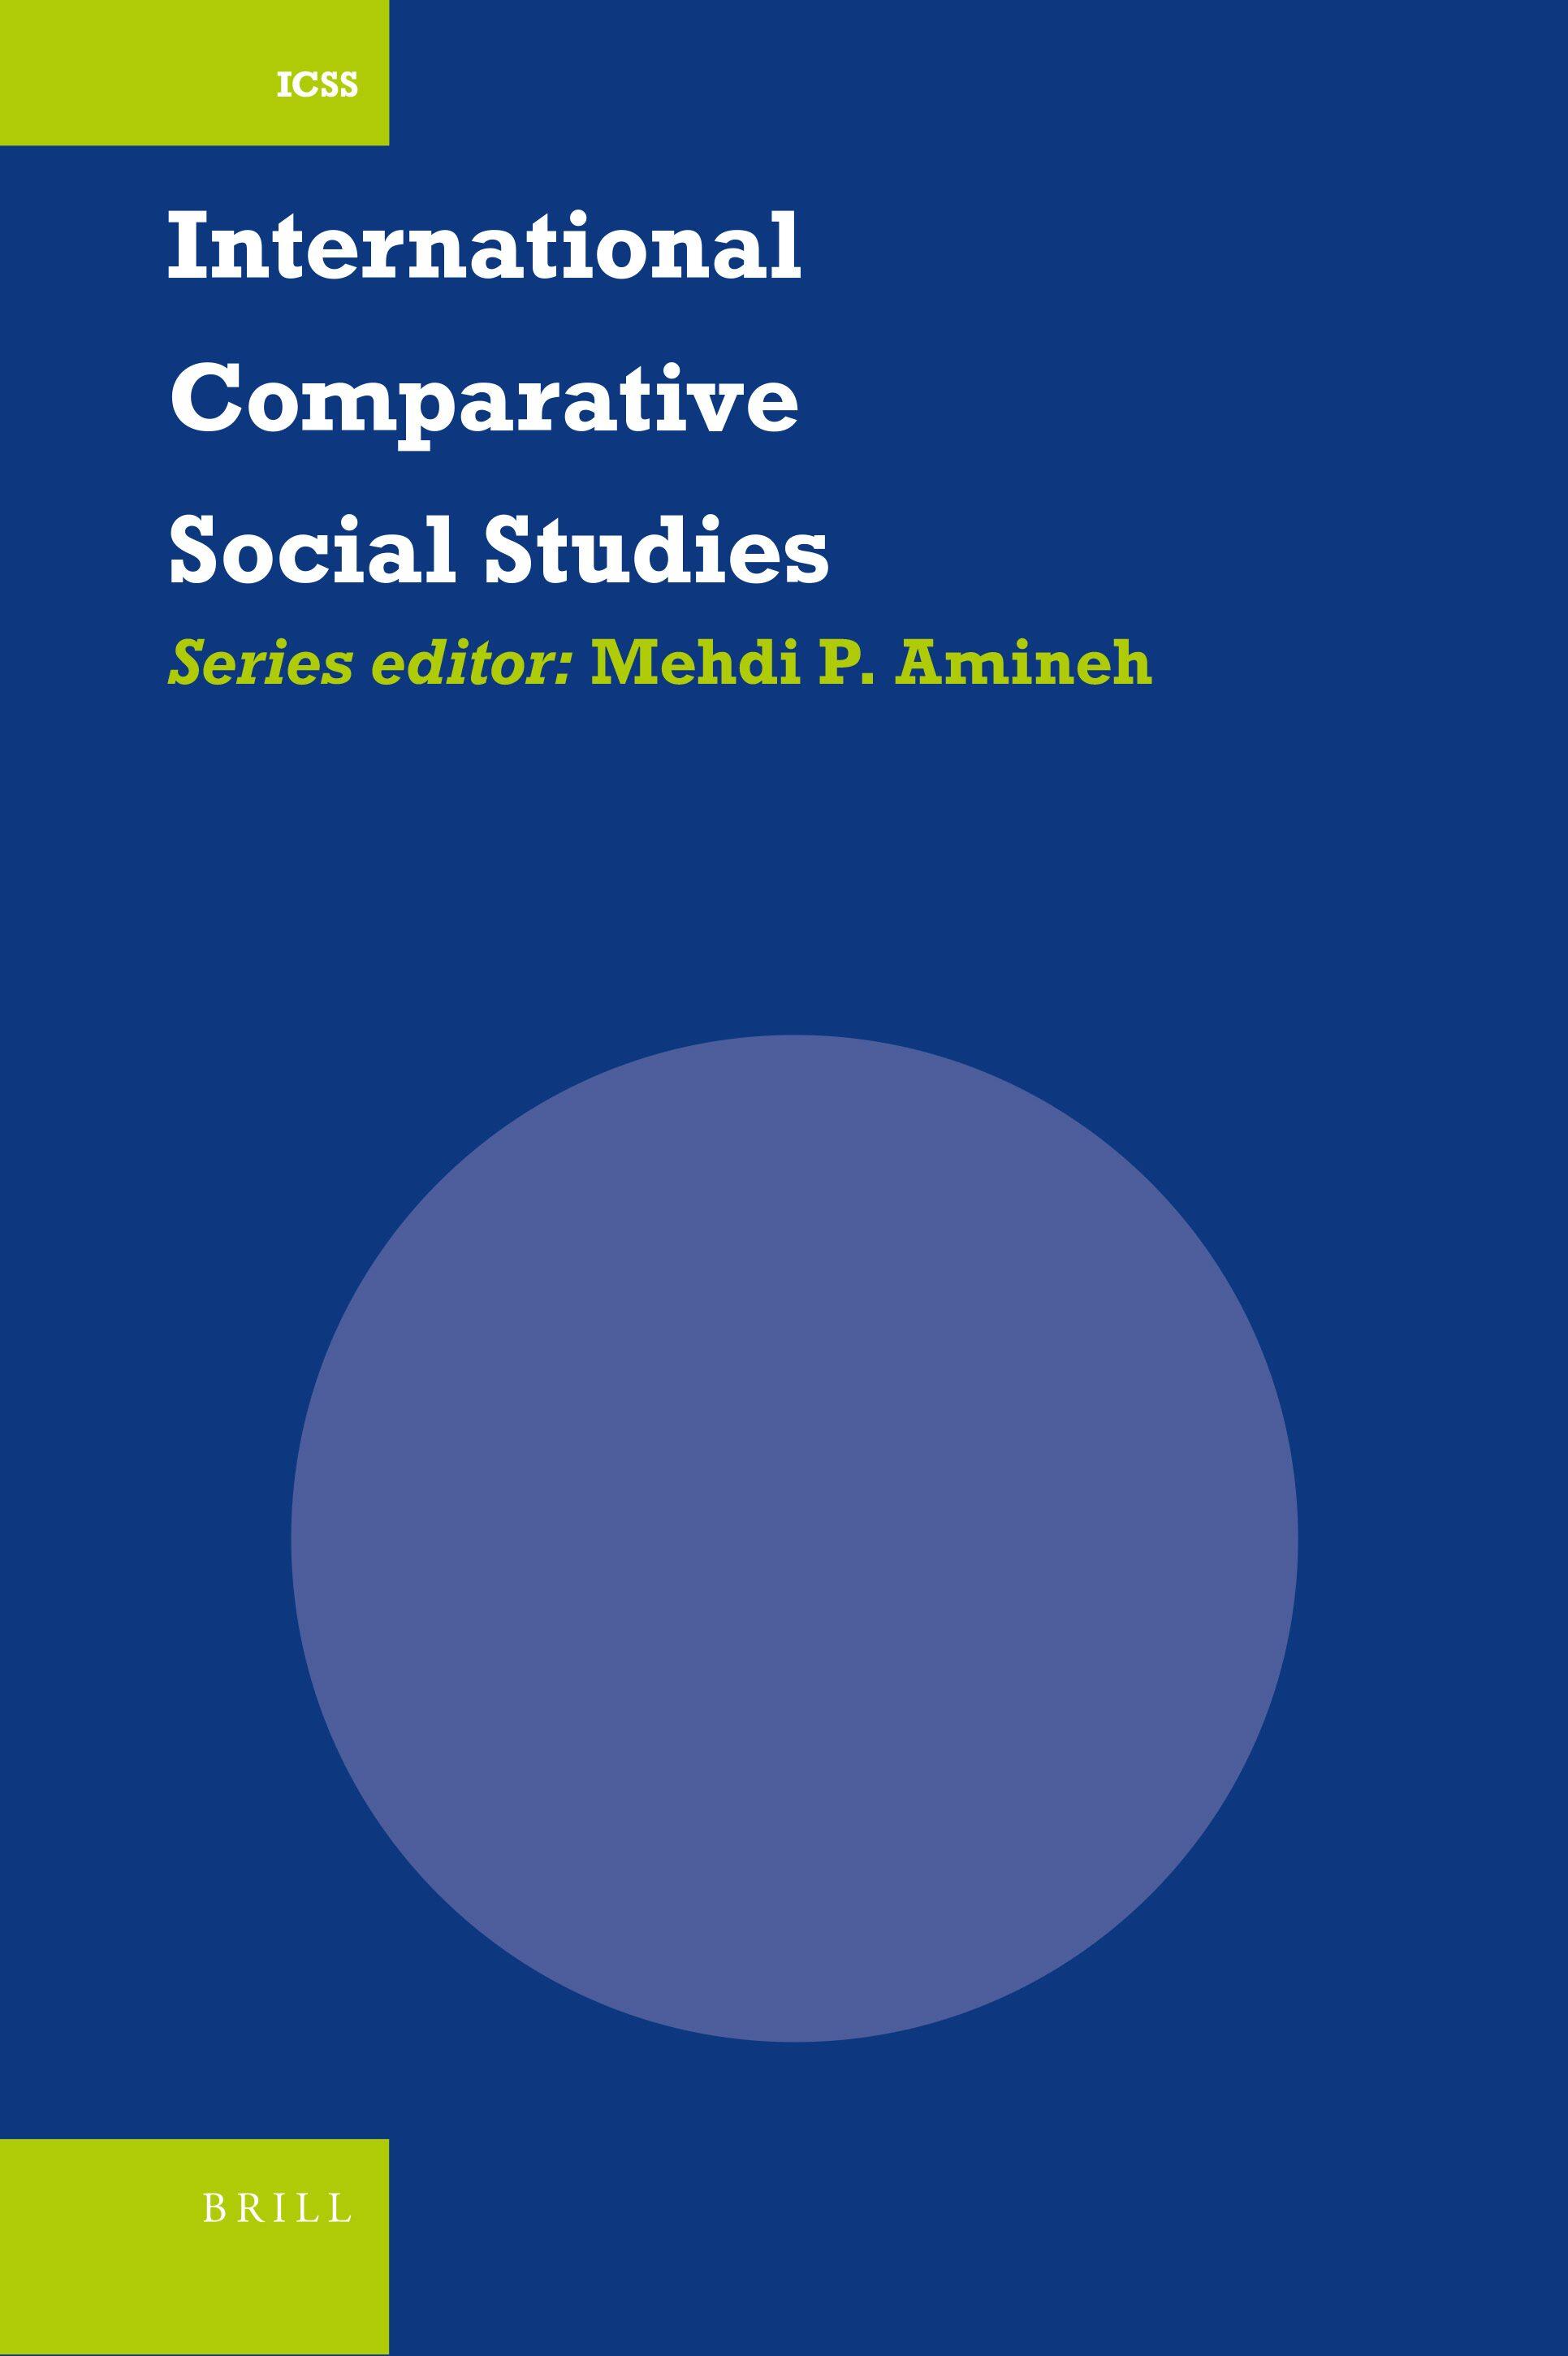 Joint Ventures: Religious Studies and Social Sciences